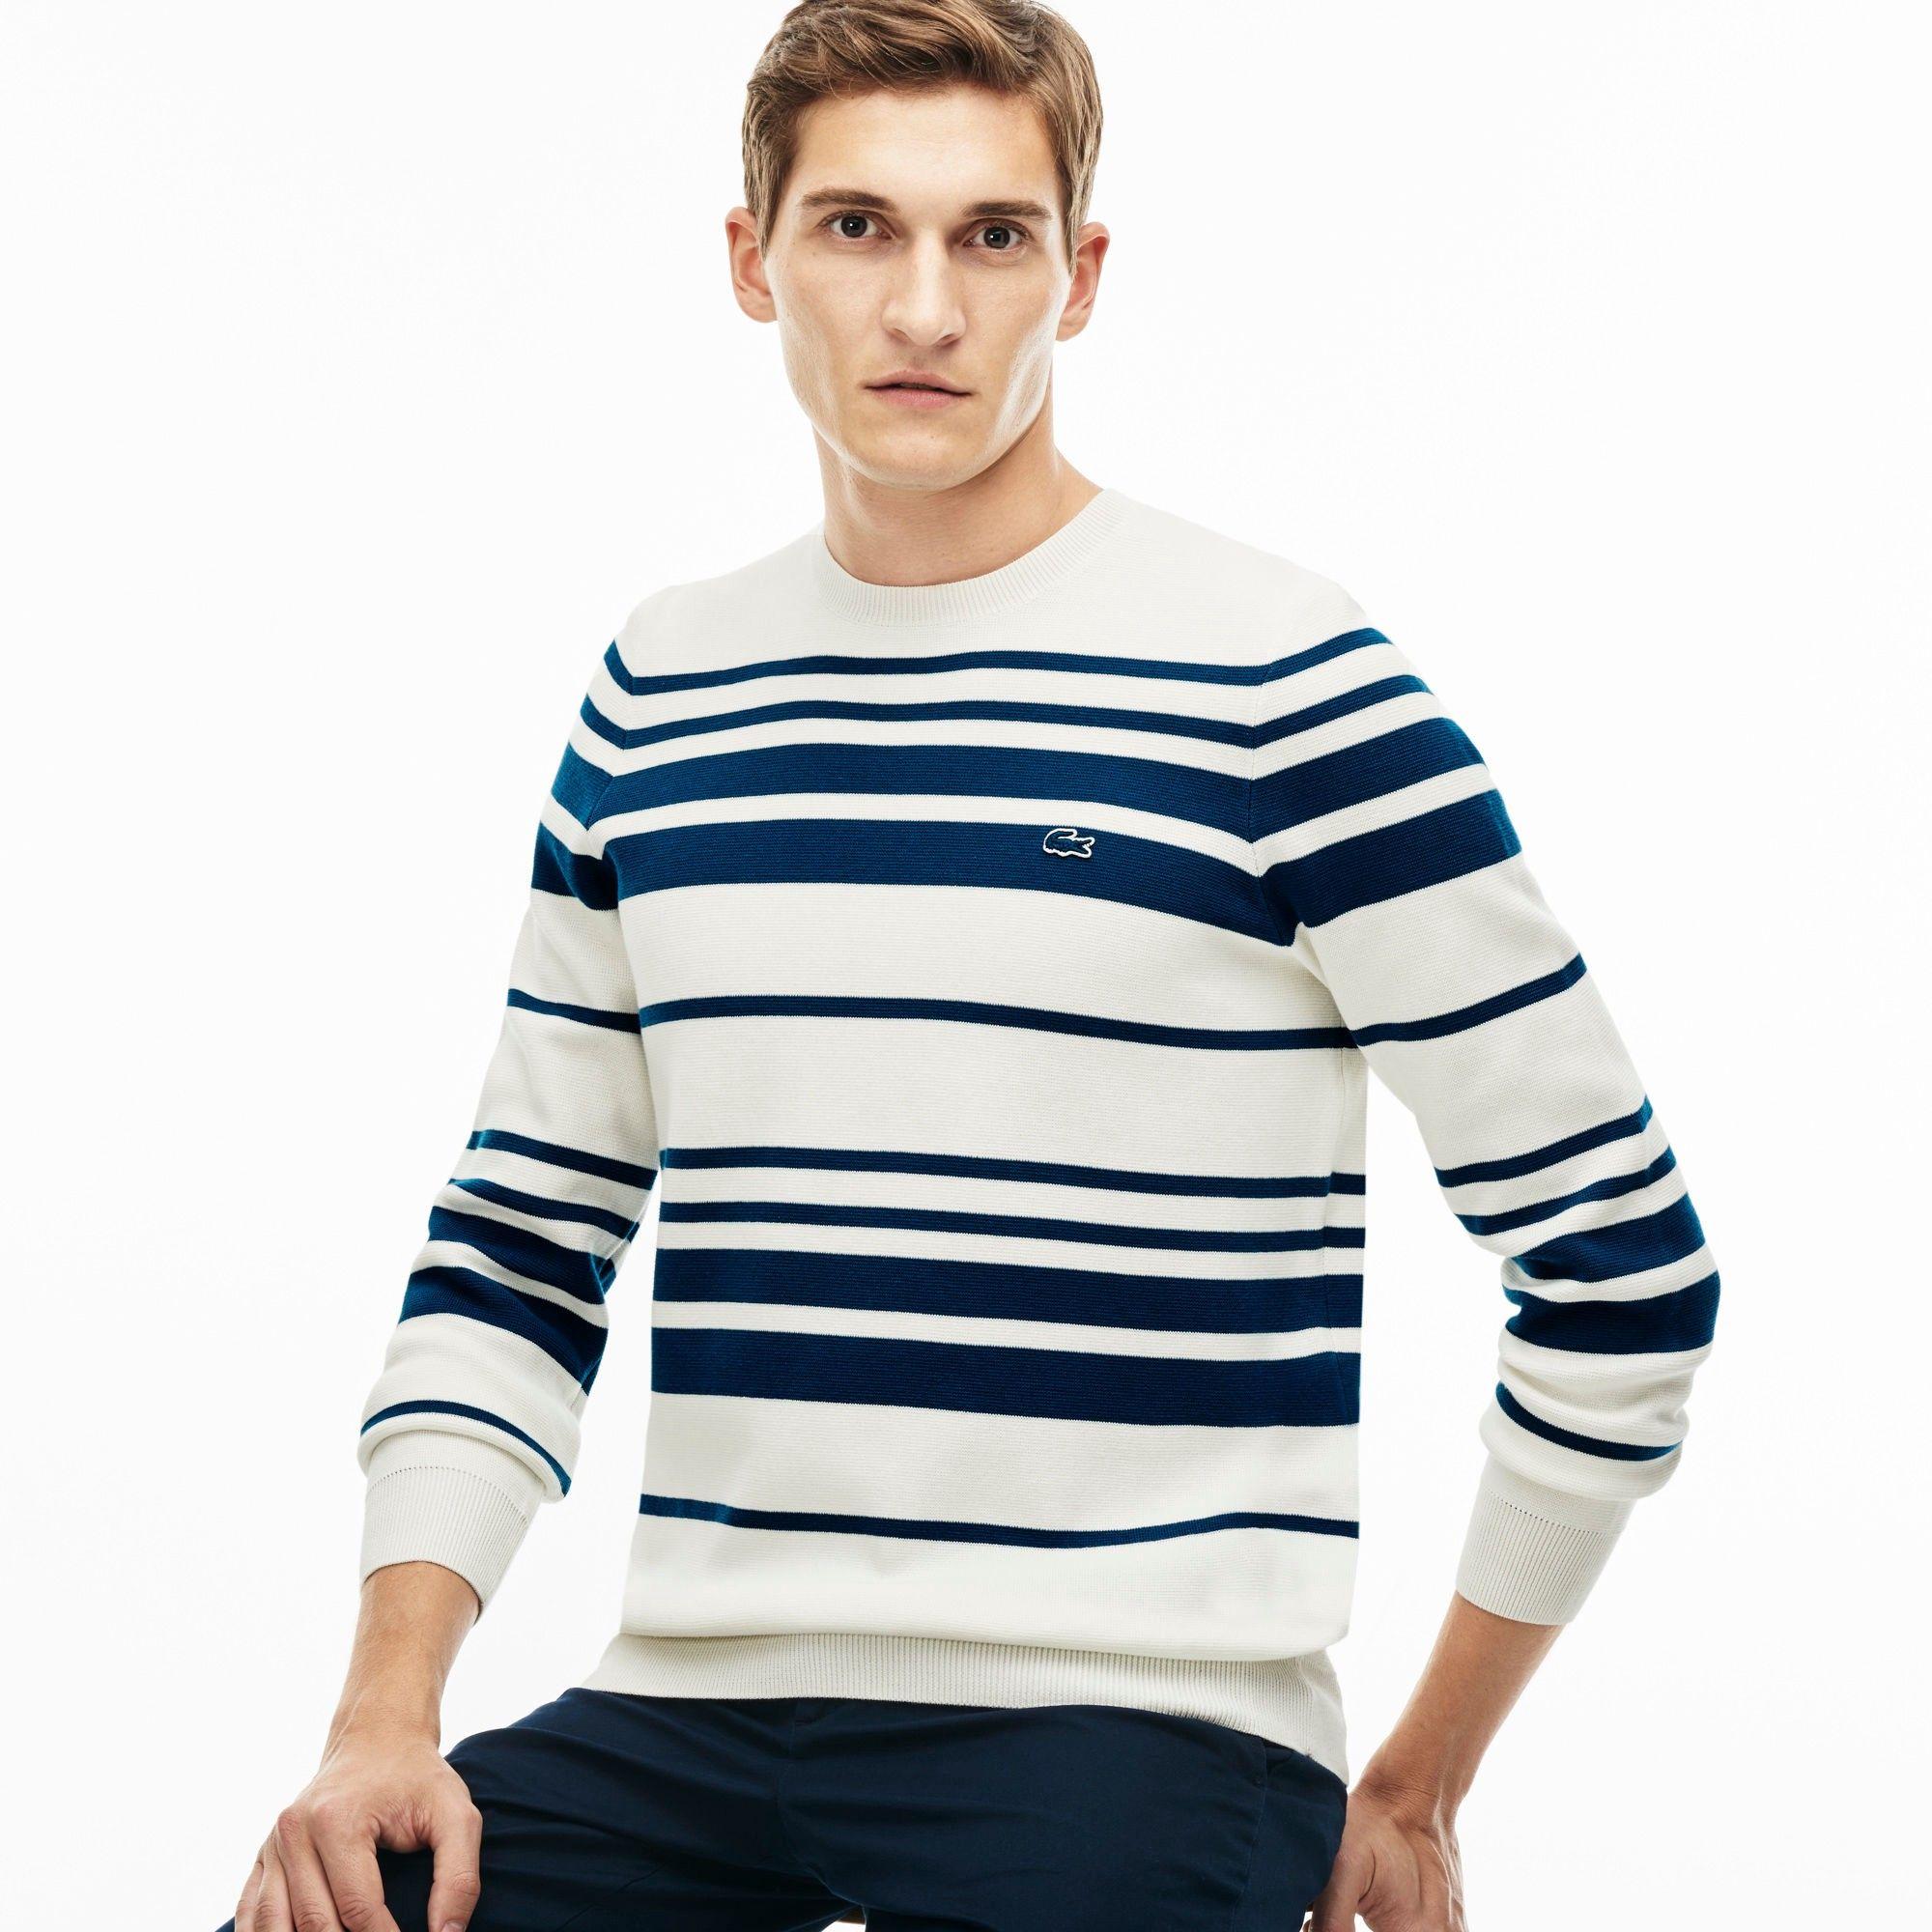 488b16321b LACOSTE Men's Crew Neck Striped Milano Cotton Sweater - flour/legion ...